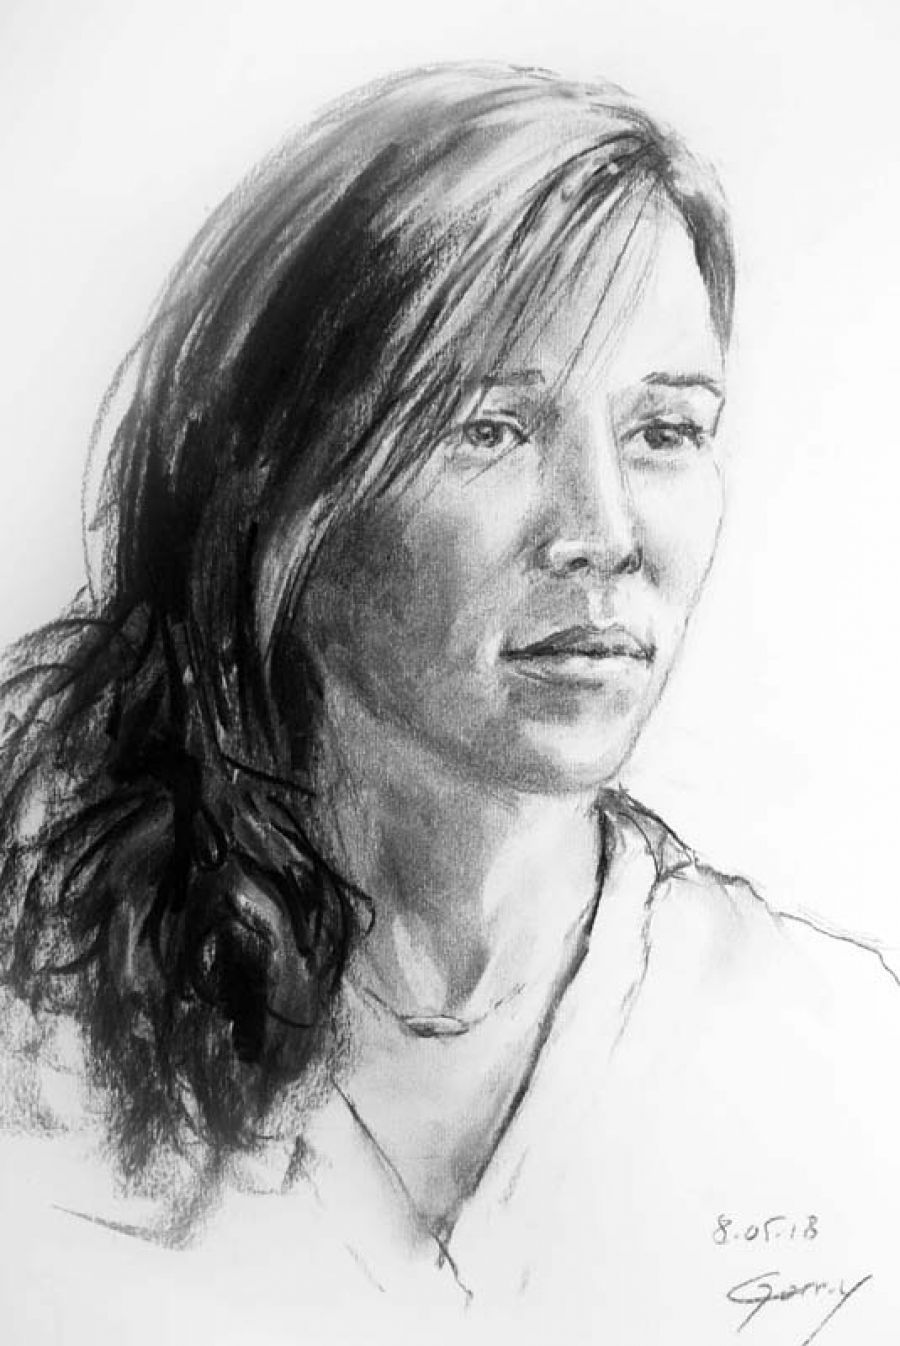 Résidence/Exposition Brigitte Gorry, artiste peintre.